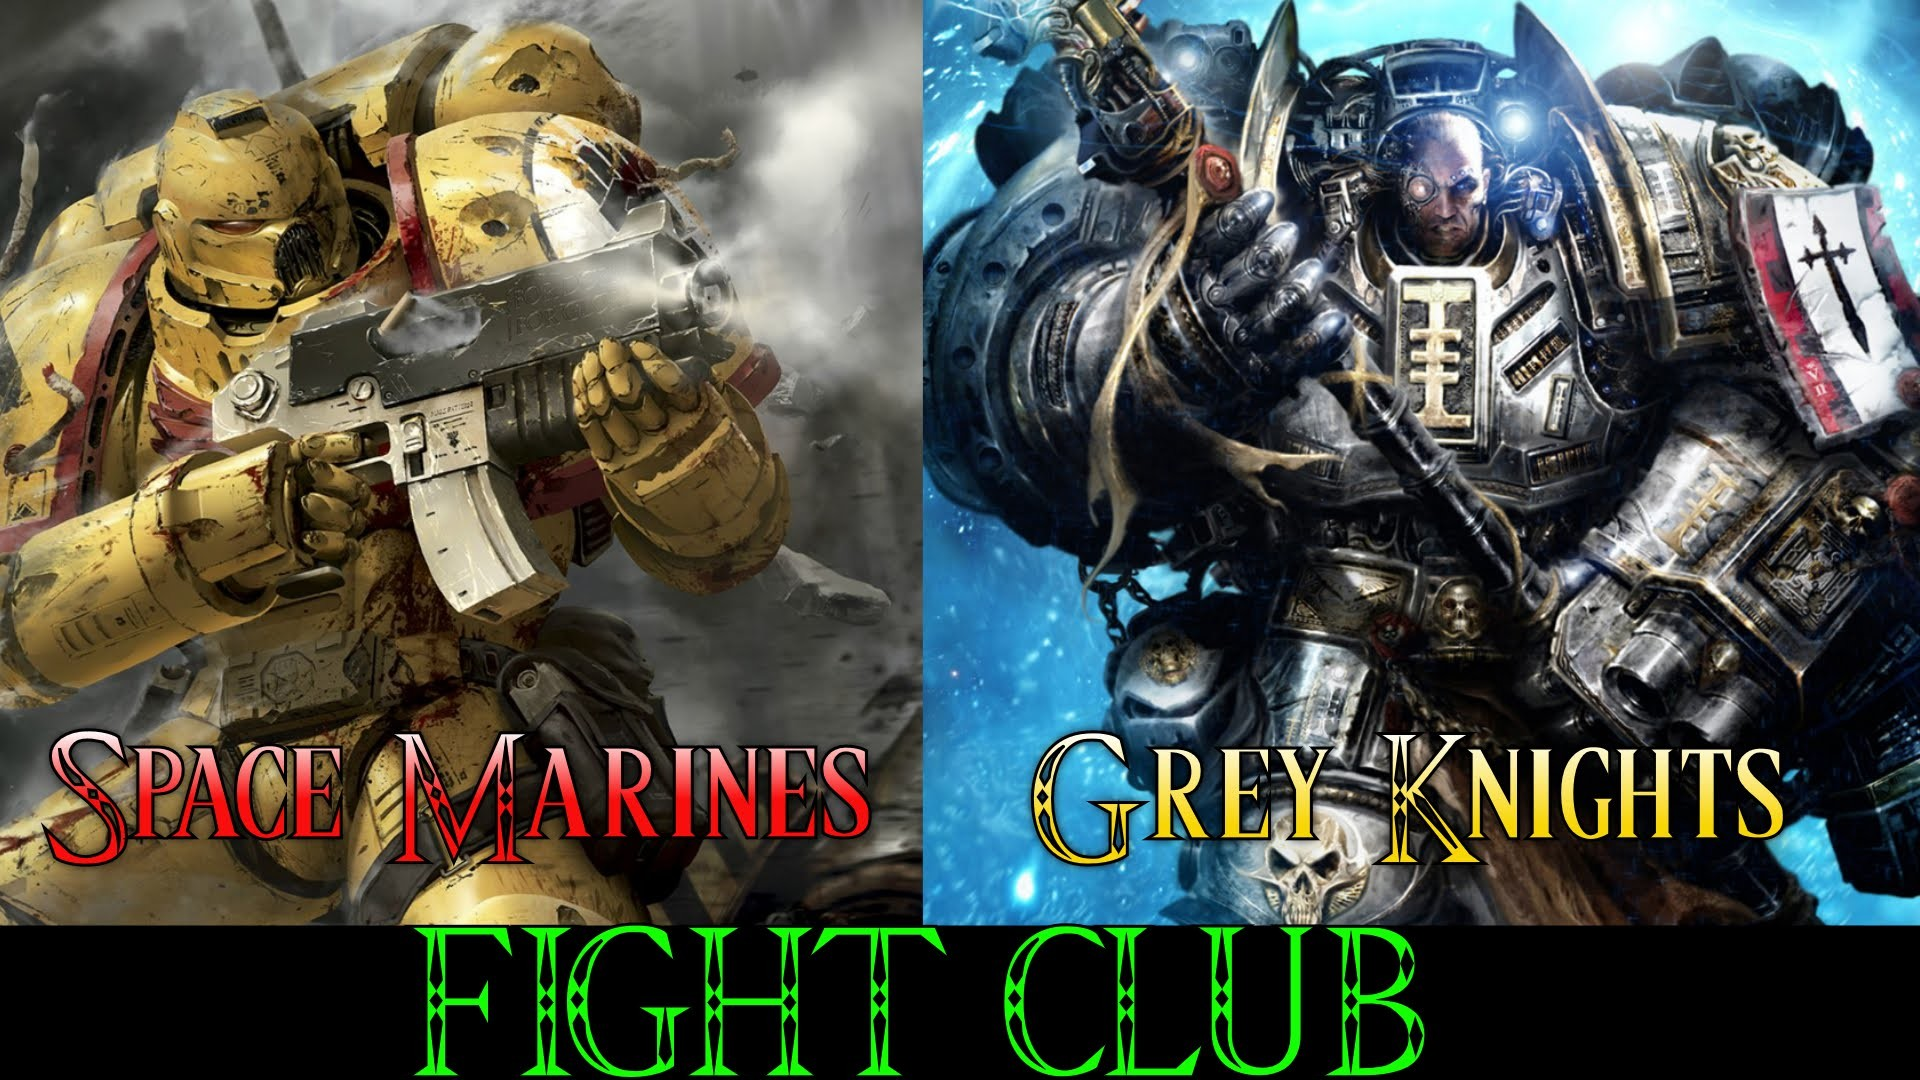 Space Marines vs Grey Knights